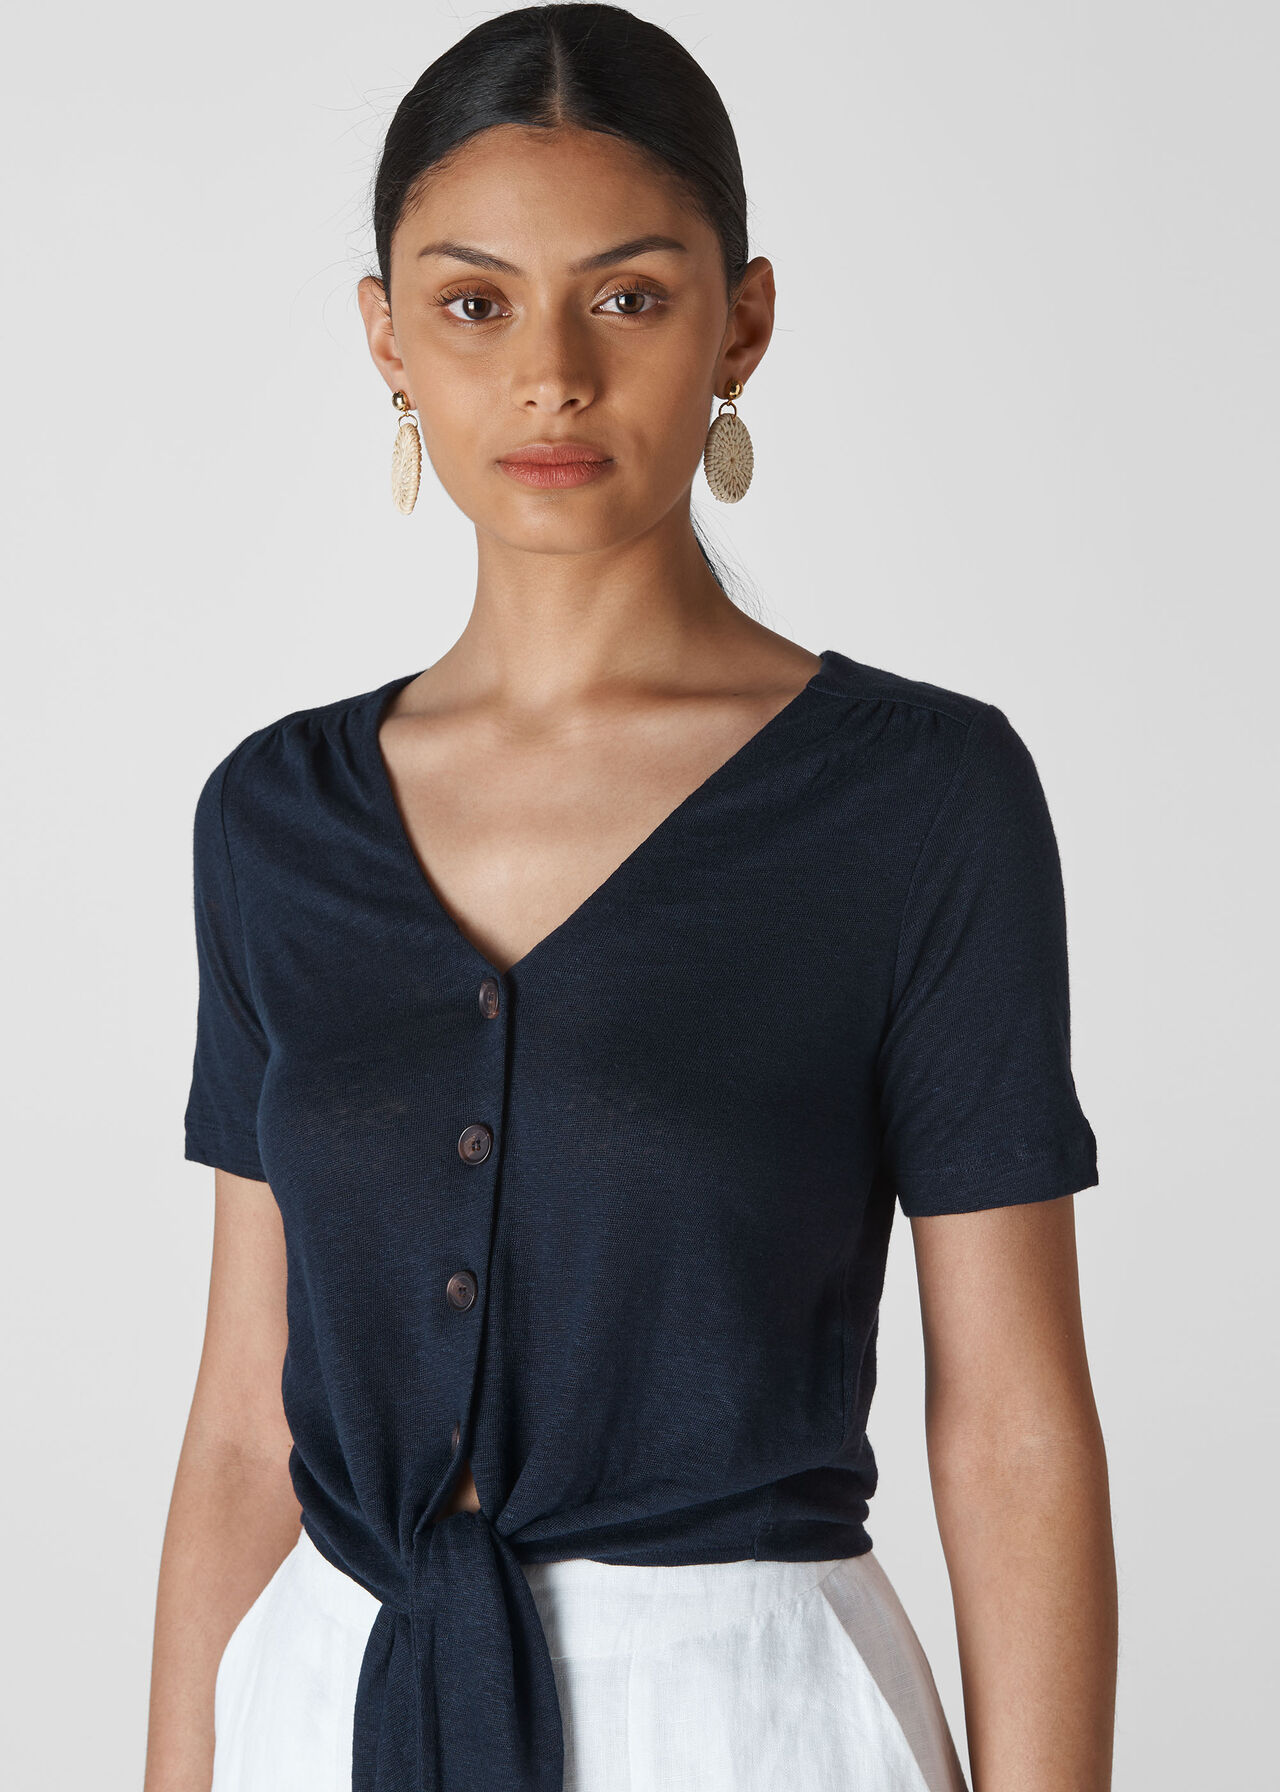 Linen Button Front Tie Top Navy